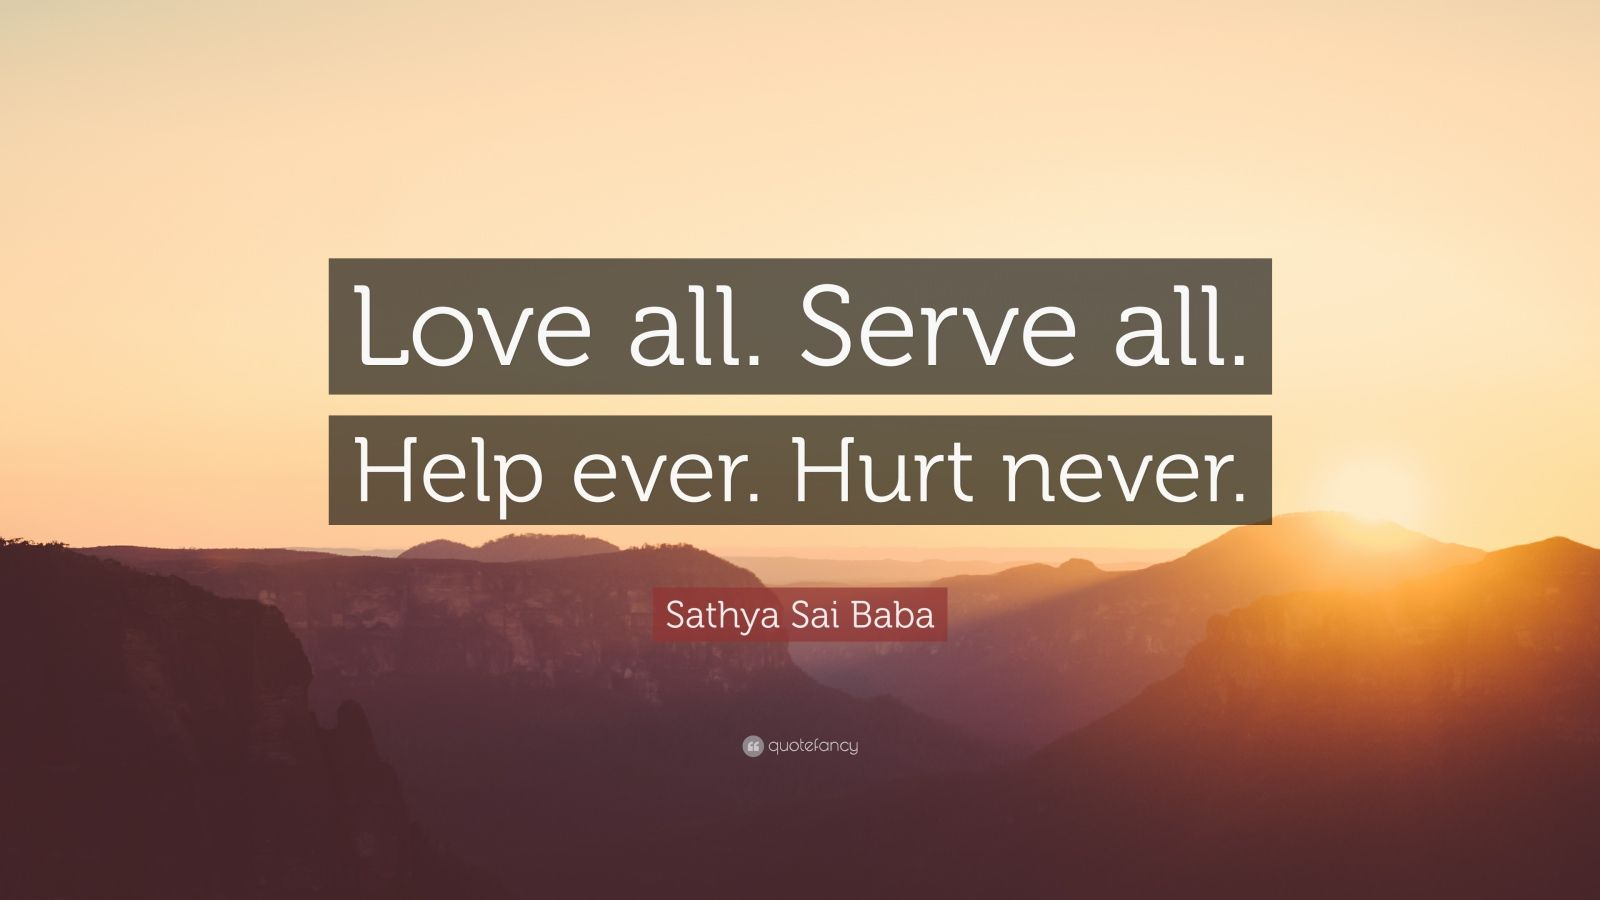 Saint Luke's Episcopal Church, Forest Hills NY  |Love Never Ever Hurt